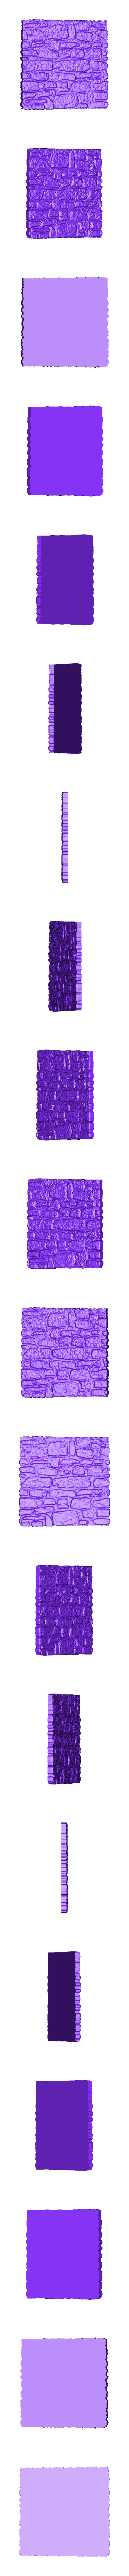 pierre.stl Download free STL file Stone Texture • 3D printer design, Motek3D